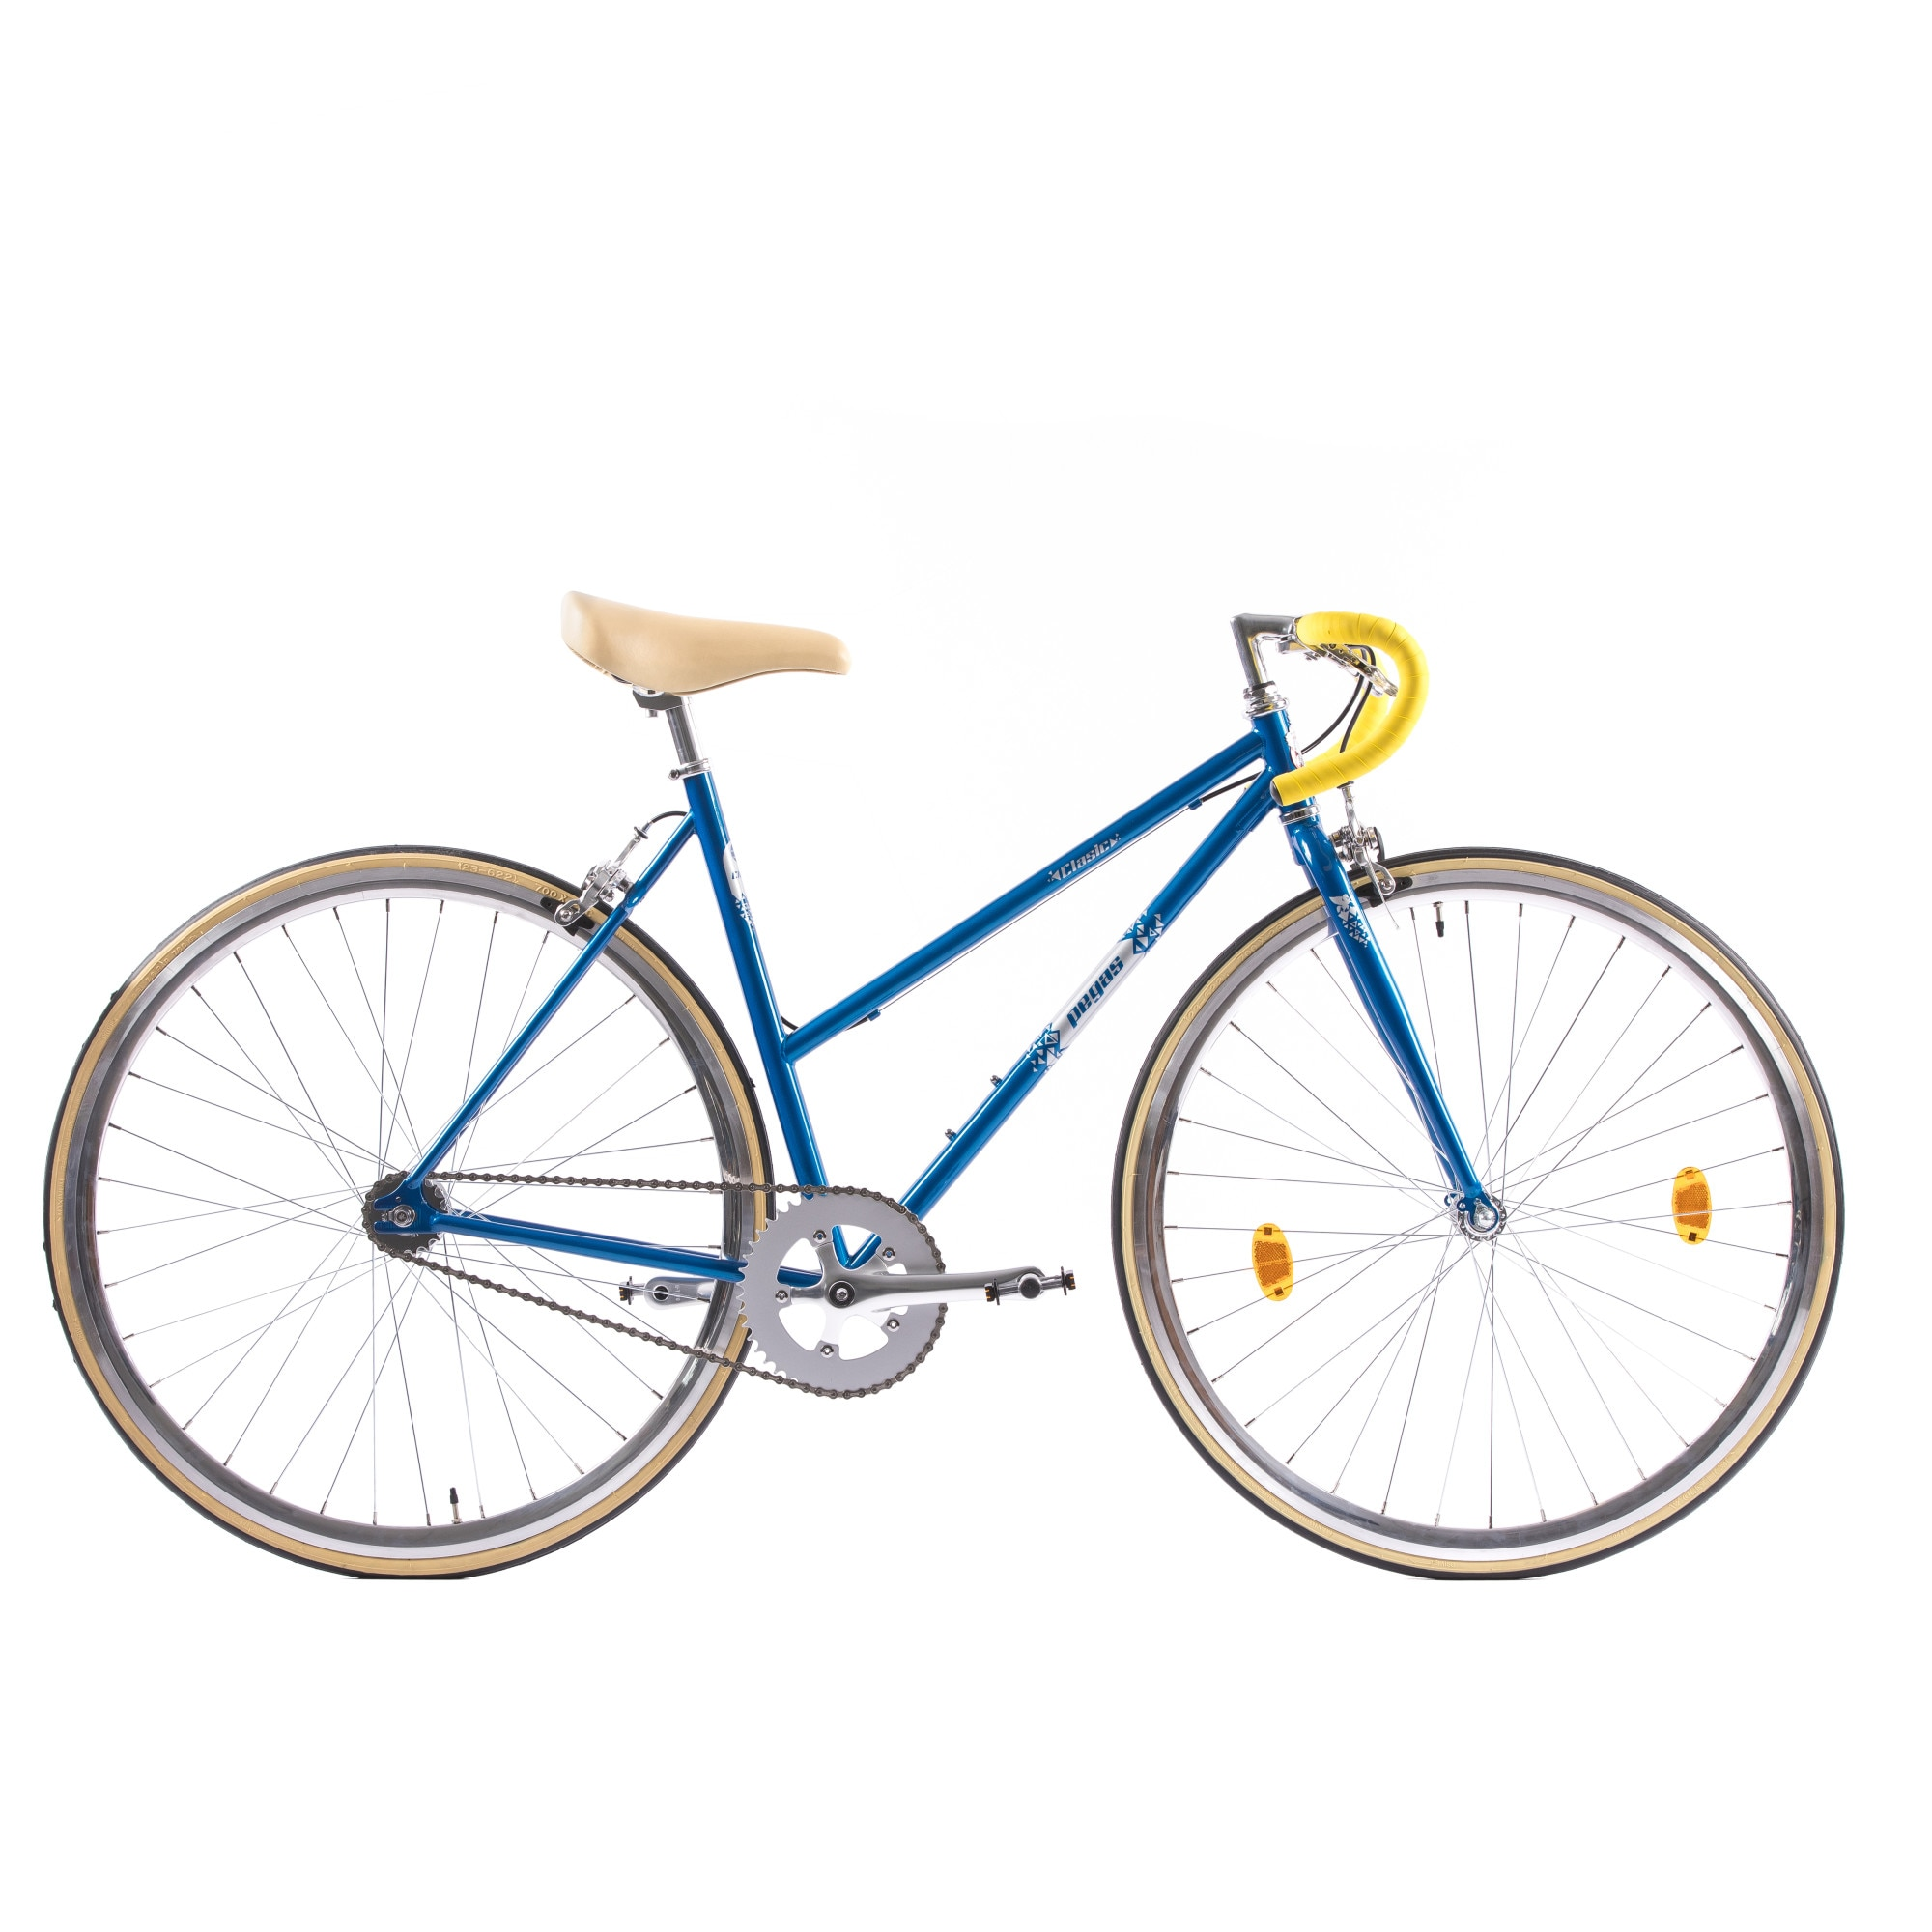 Fotografie Bicicleta Pegas Clasic 2S, Drop Lady, 50cm, Bleu